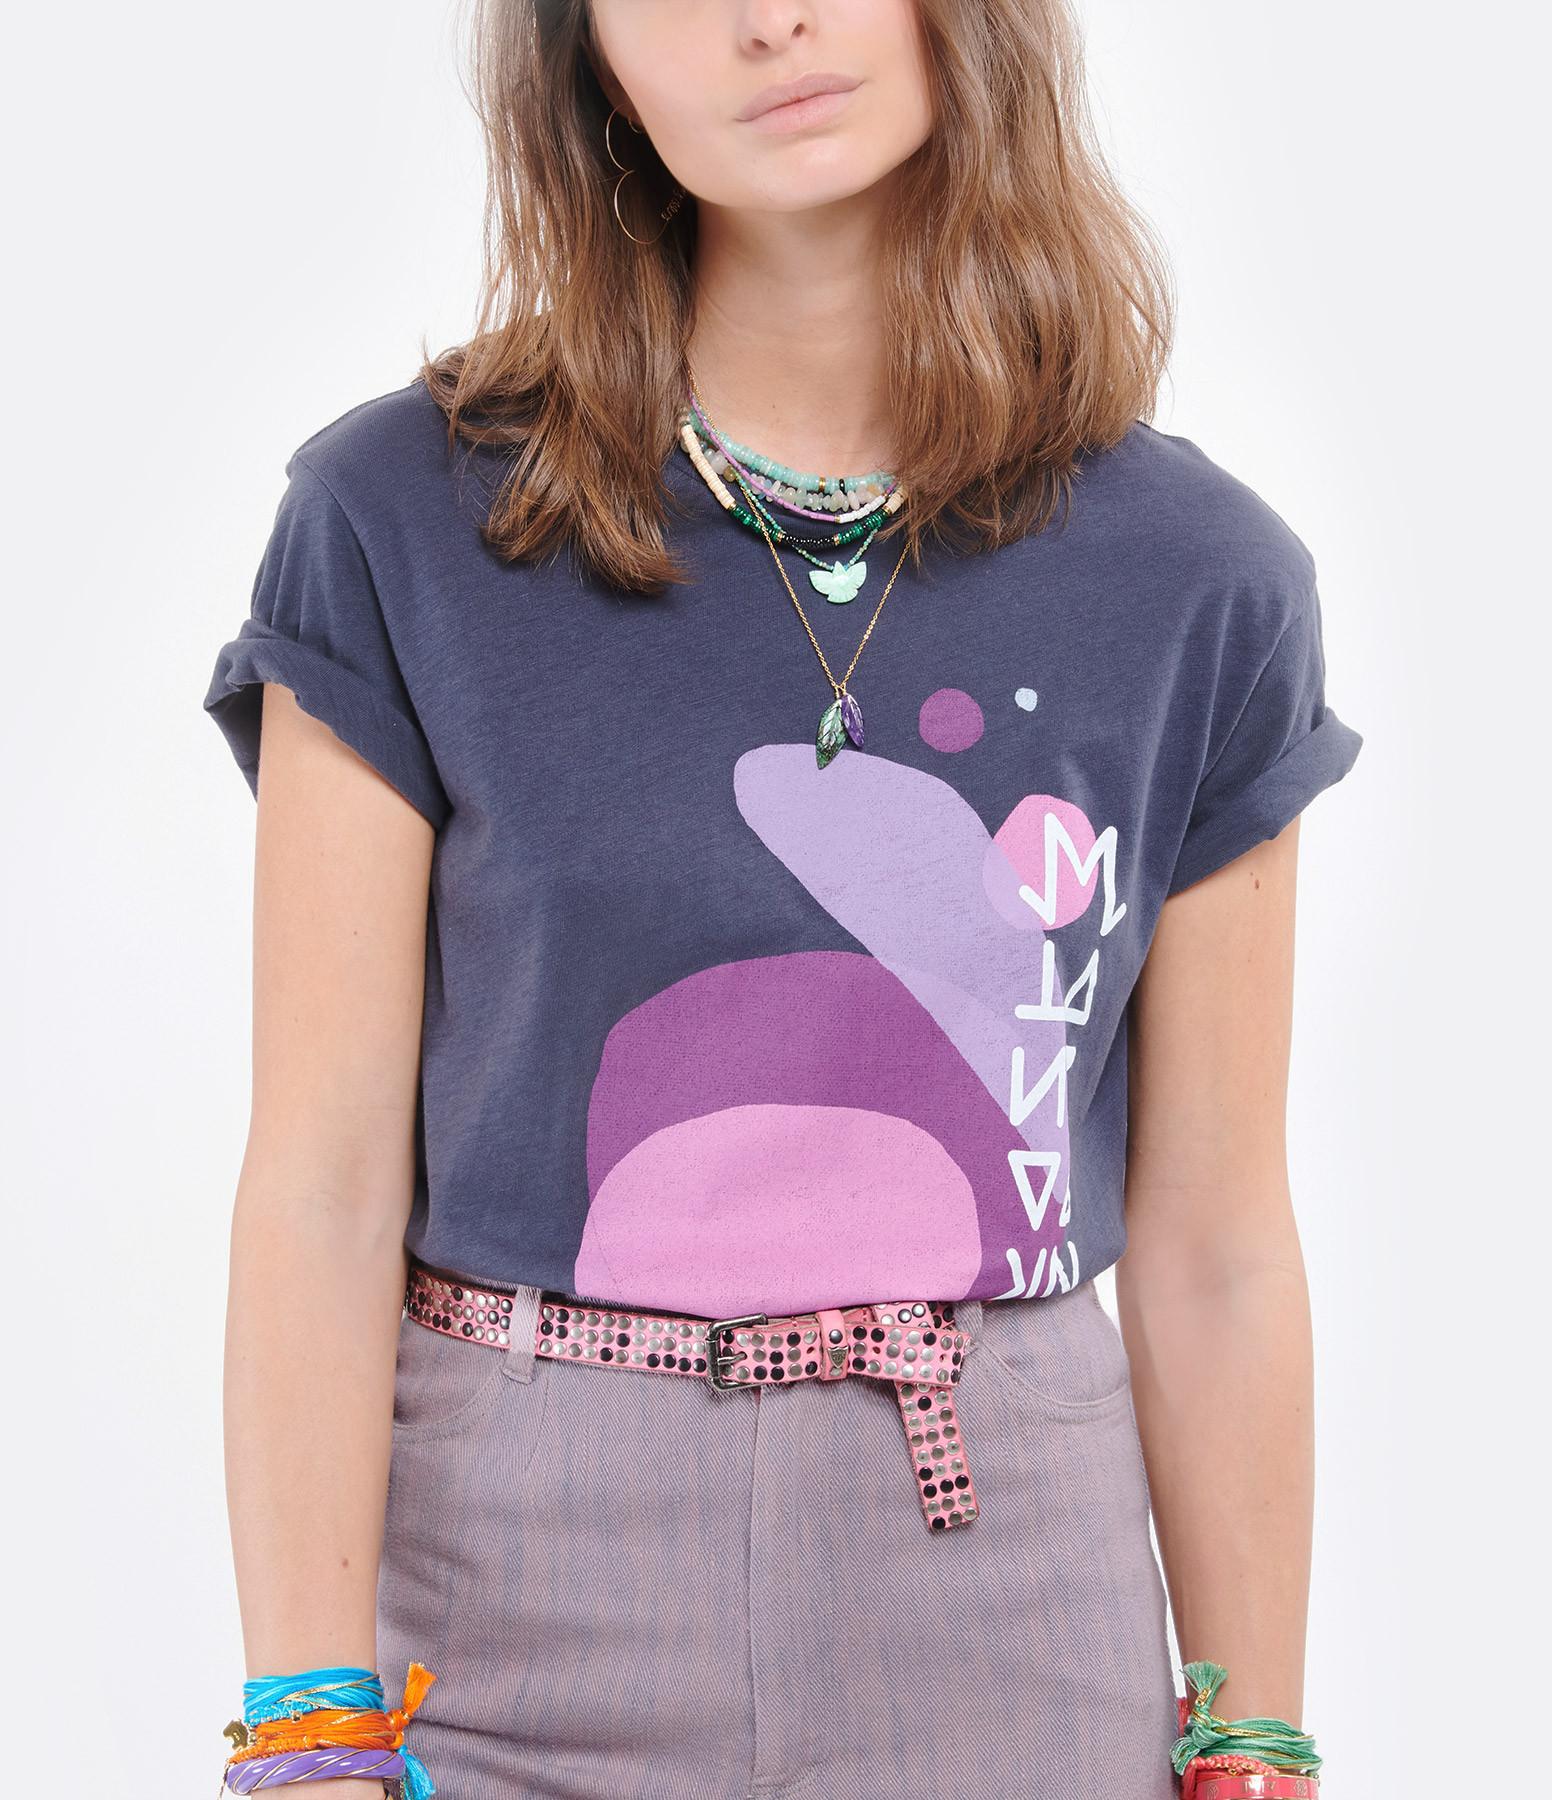 ISABEL MARANT - Tee-shirt Zaffer Coton Noir Délavé